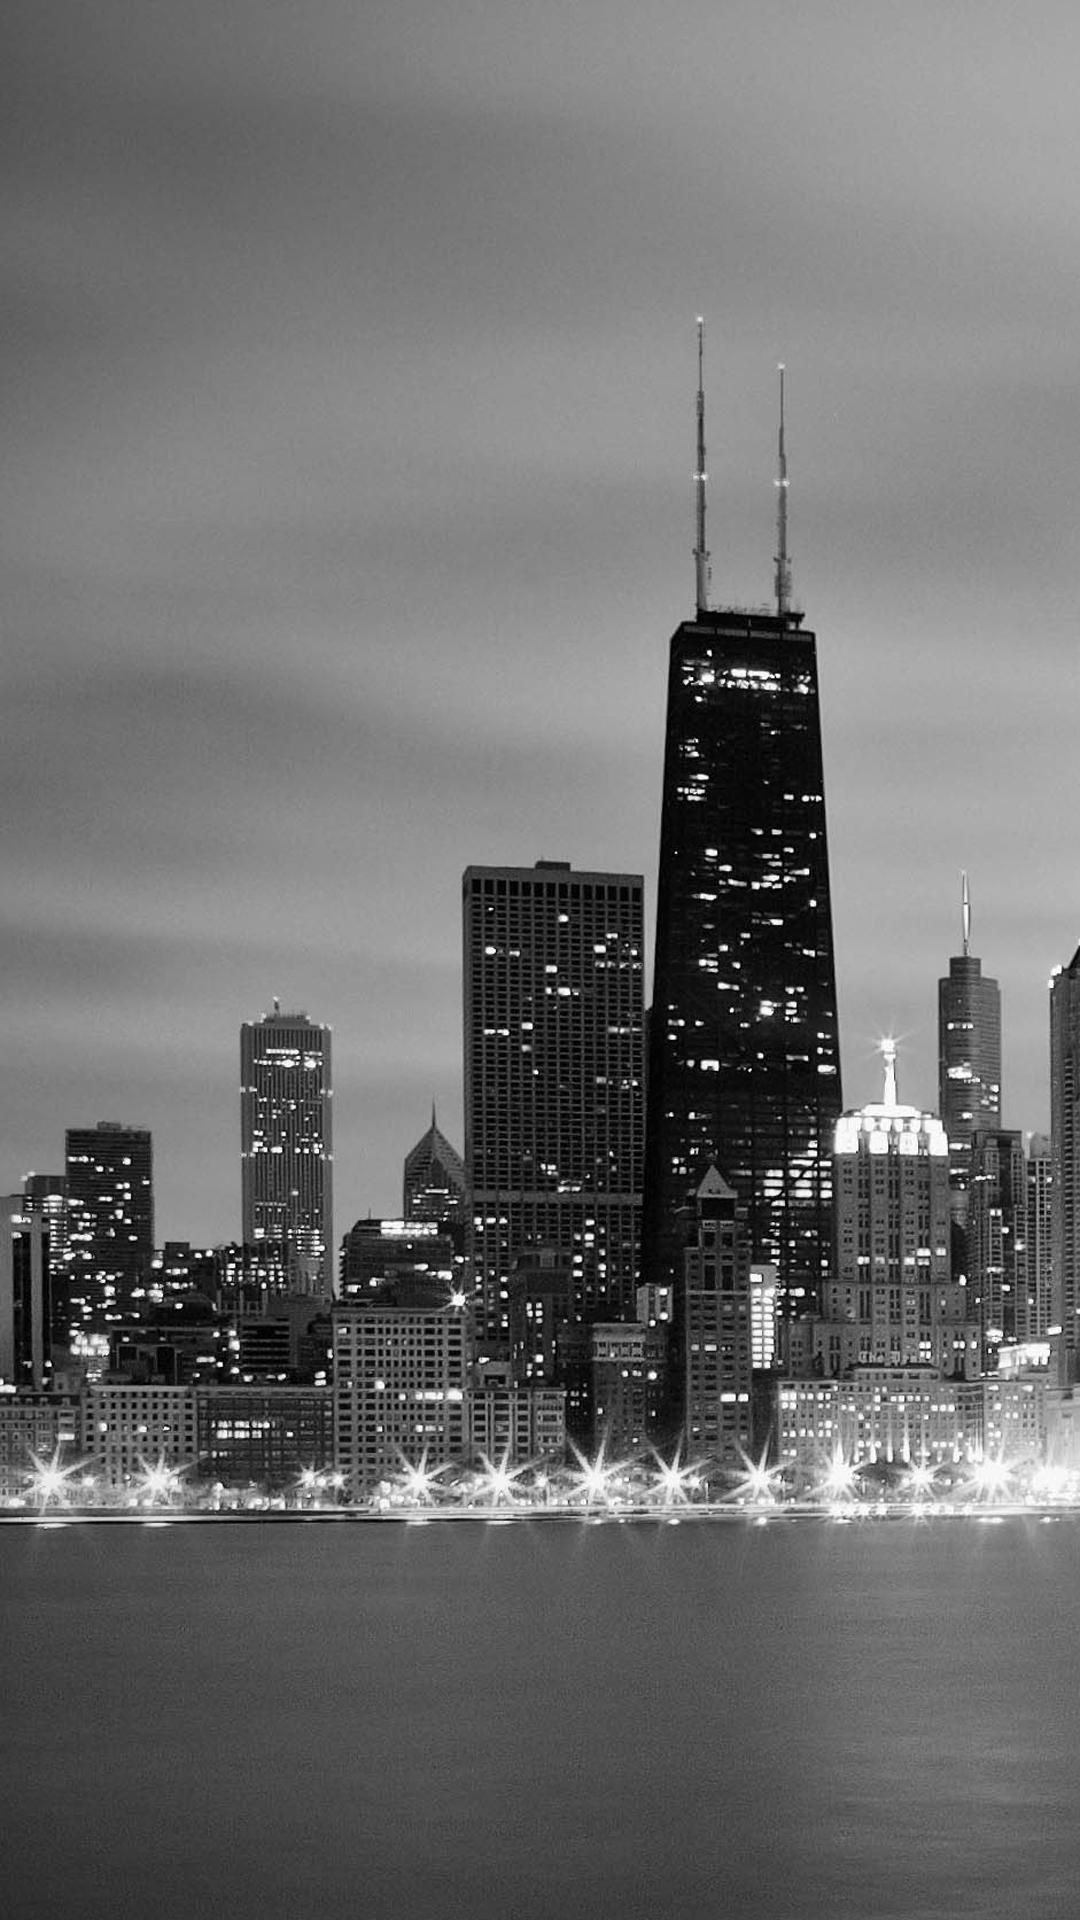 Chicago Skyline Iphone Wallpaper Hd